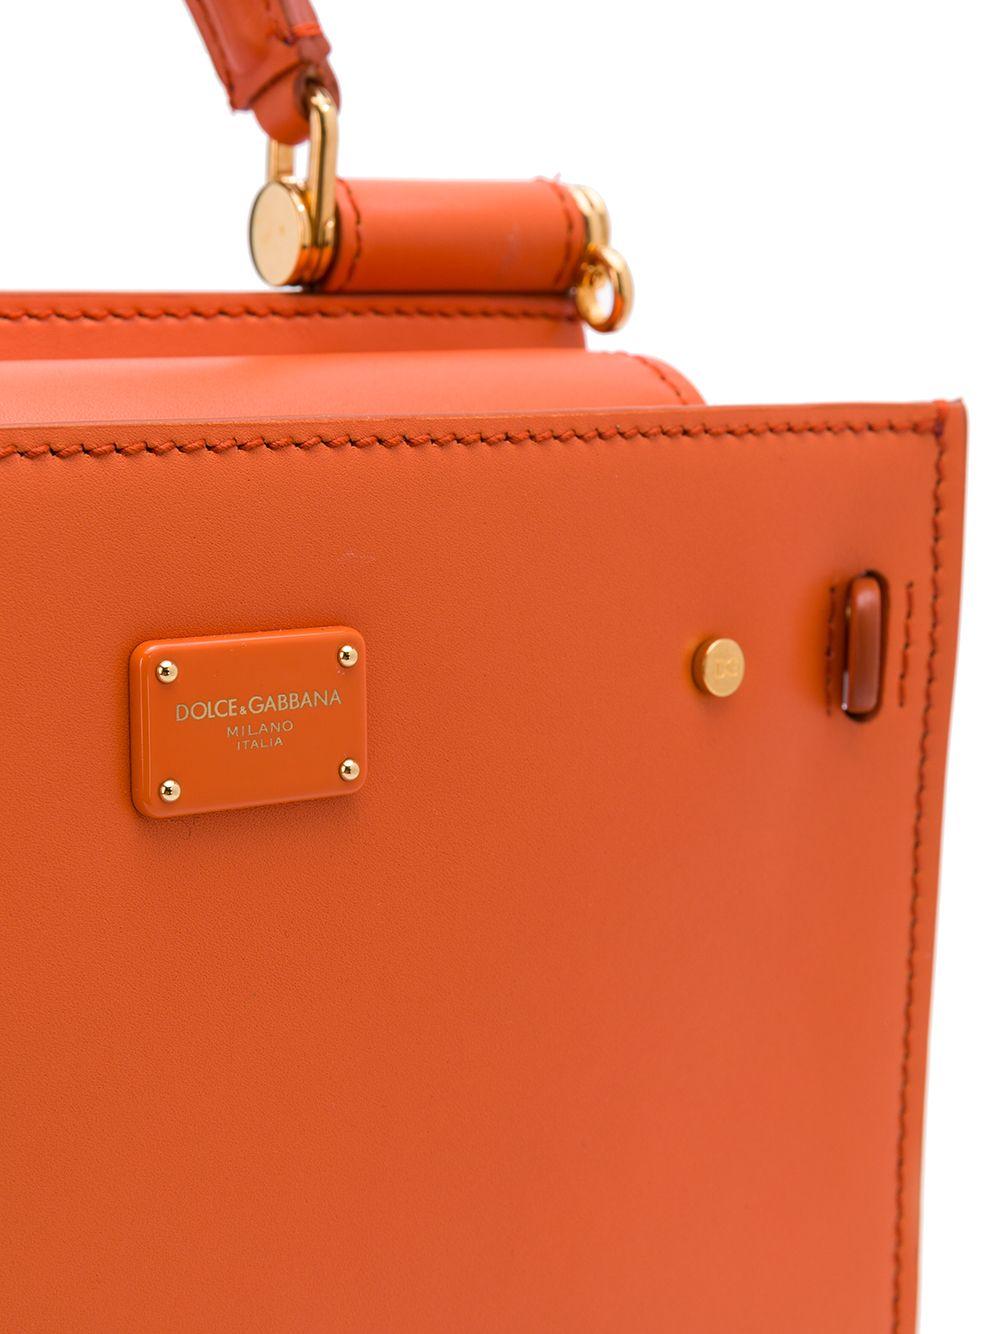 Sicily 62 orange calf-leather tote bag  DOLCE & GABBANA      BB6836-AV38580244